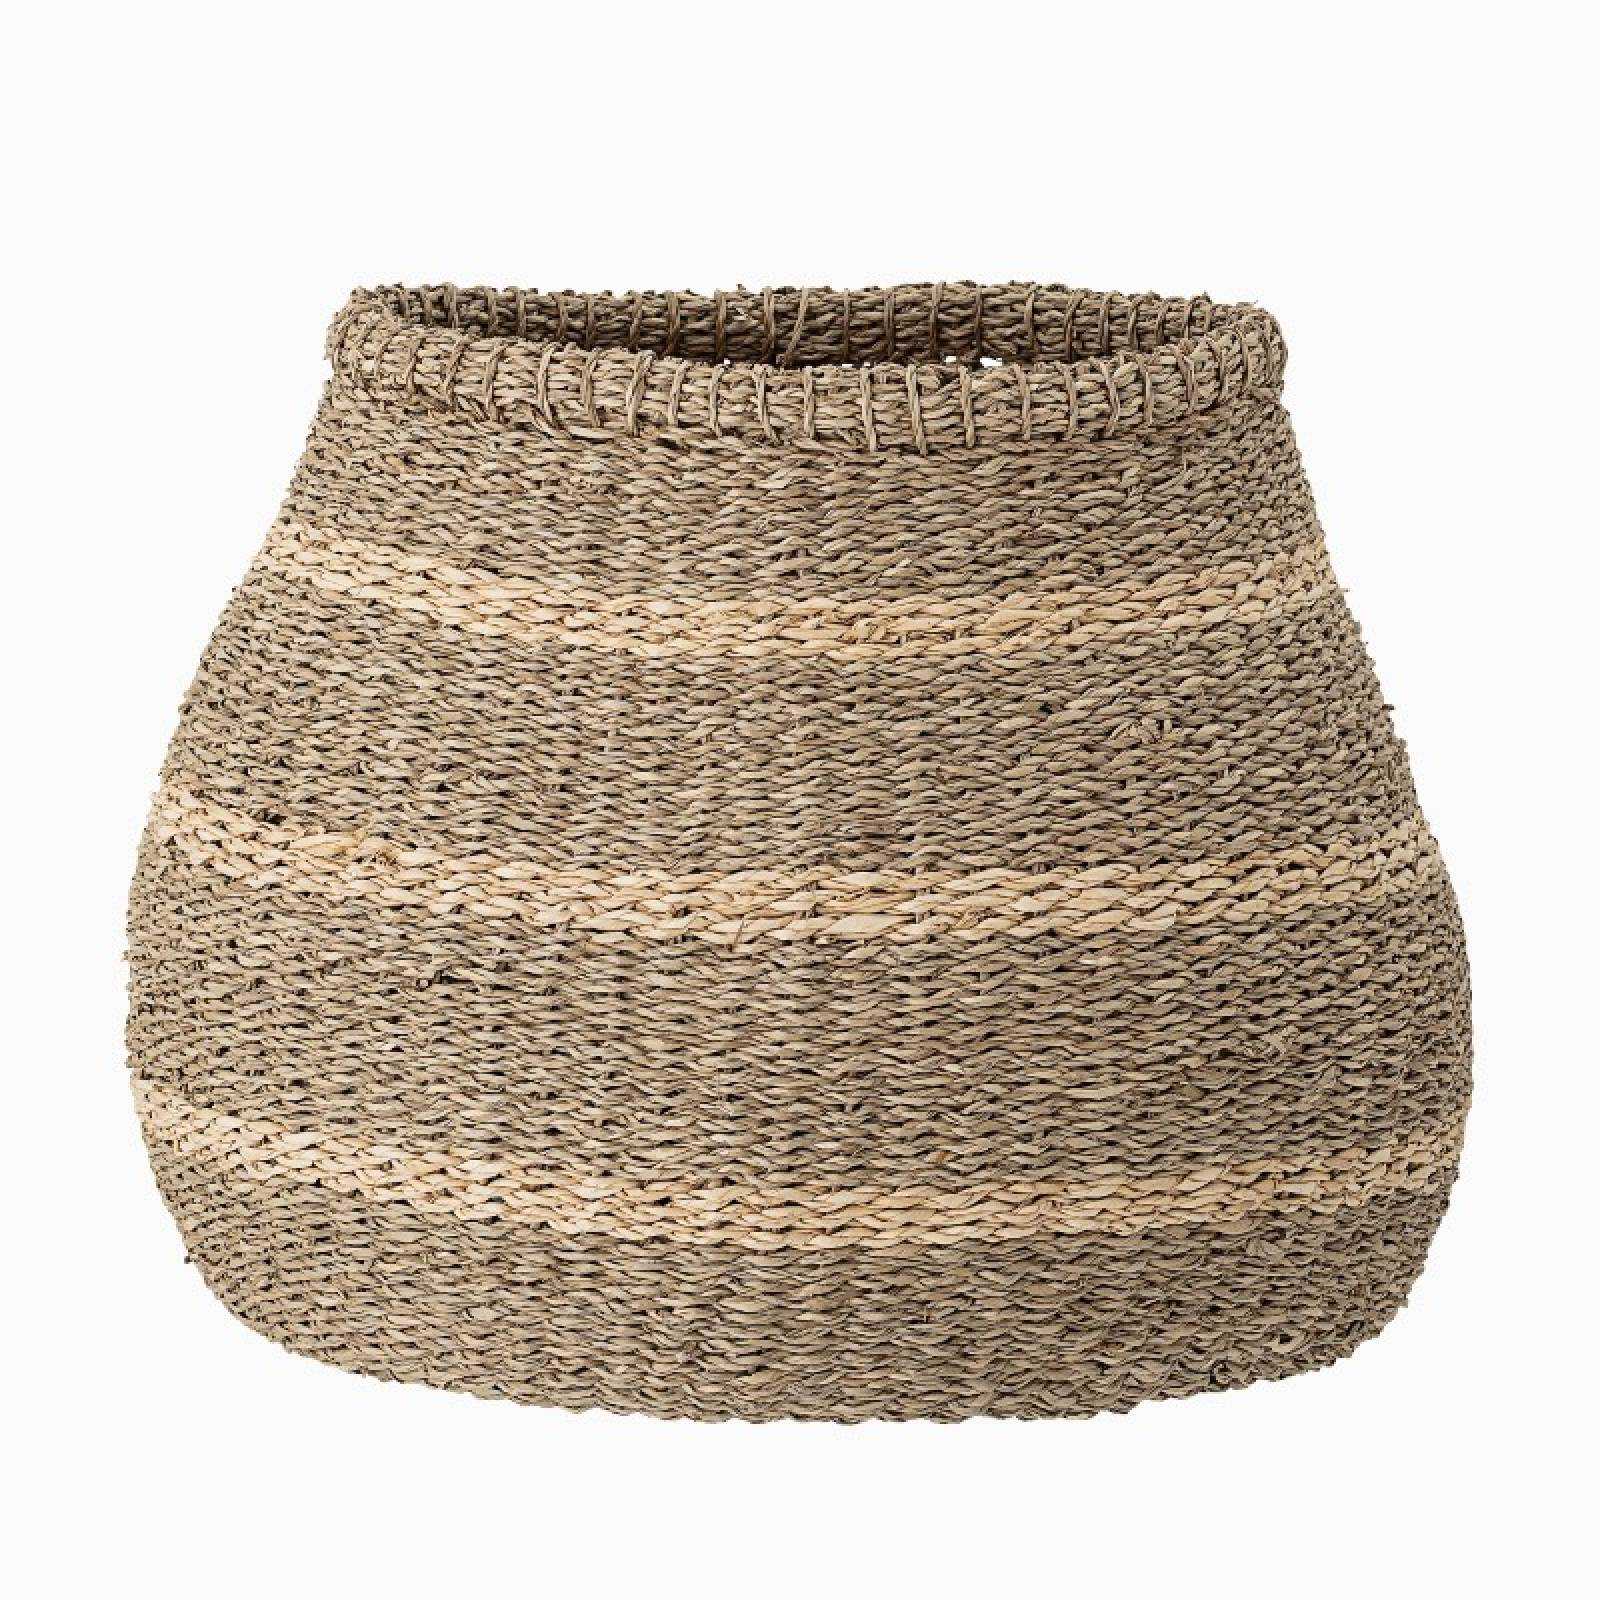 Bulbous Striped Seagrass Basket